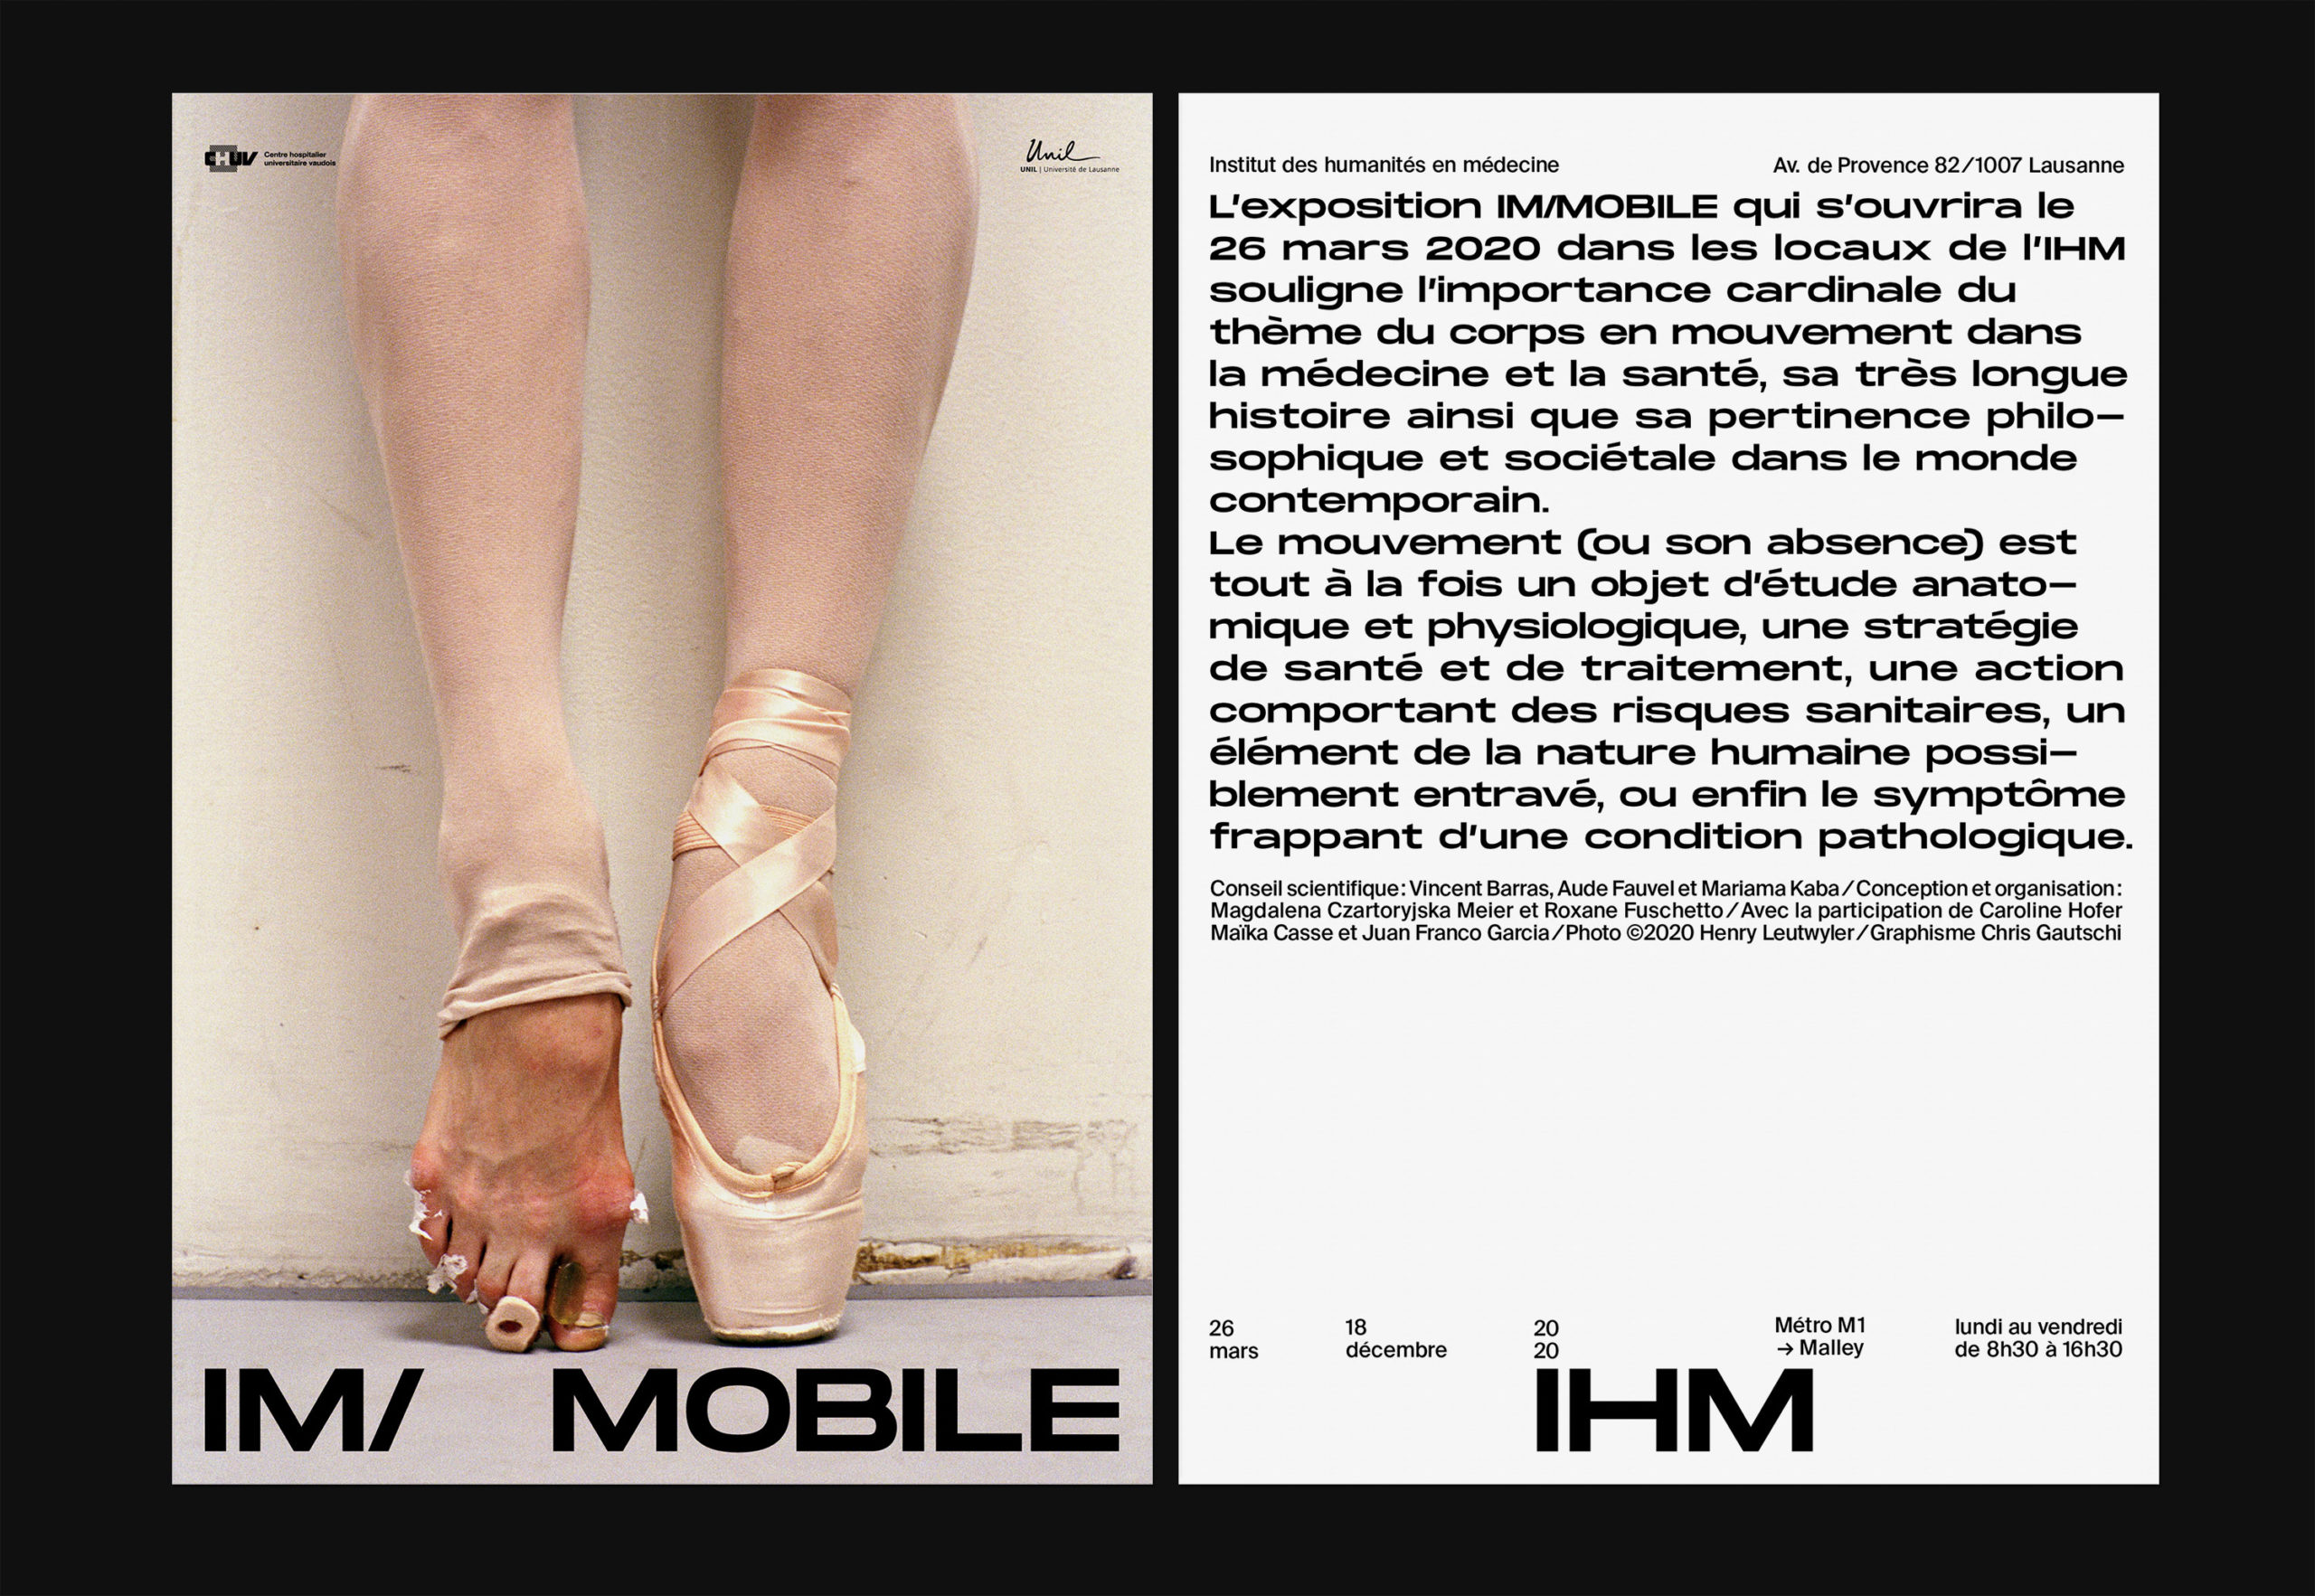 IHM_IM-MOBILE_flyer_A5